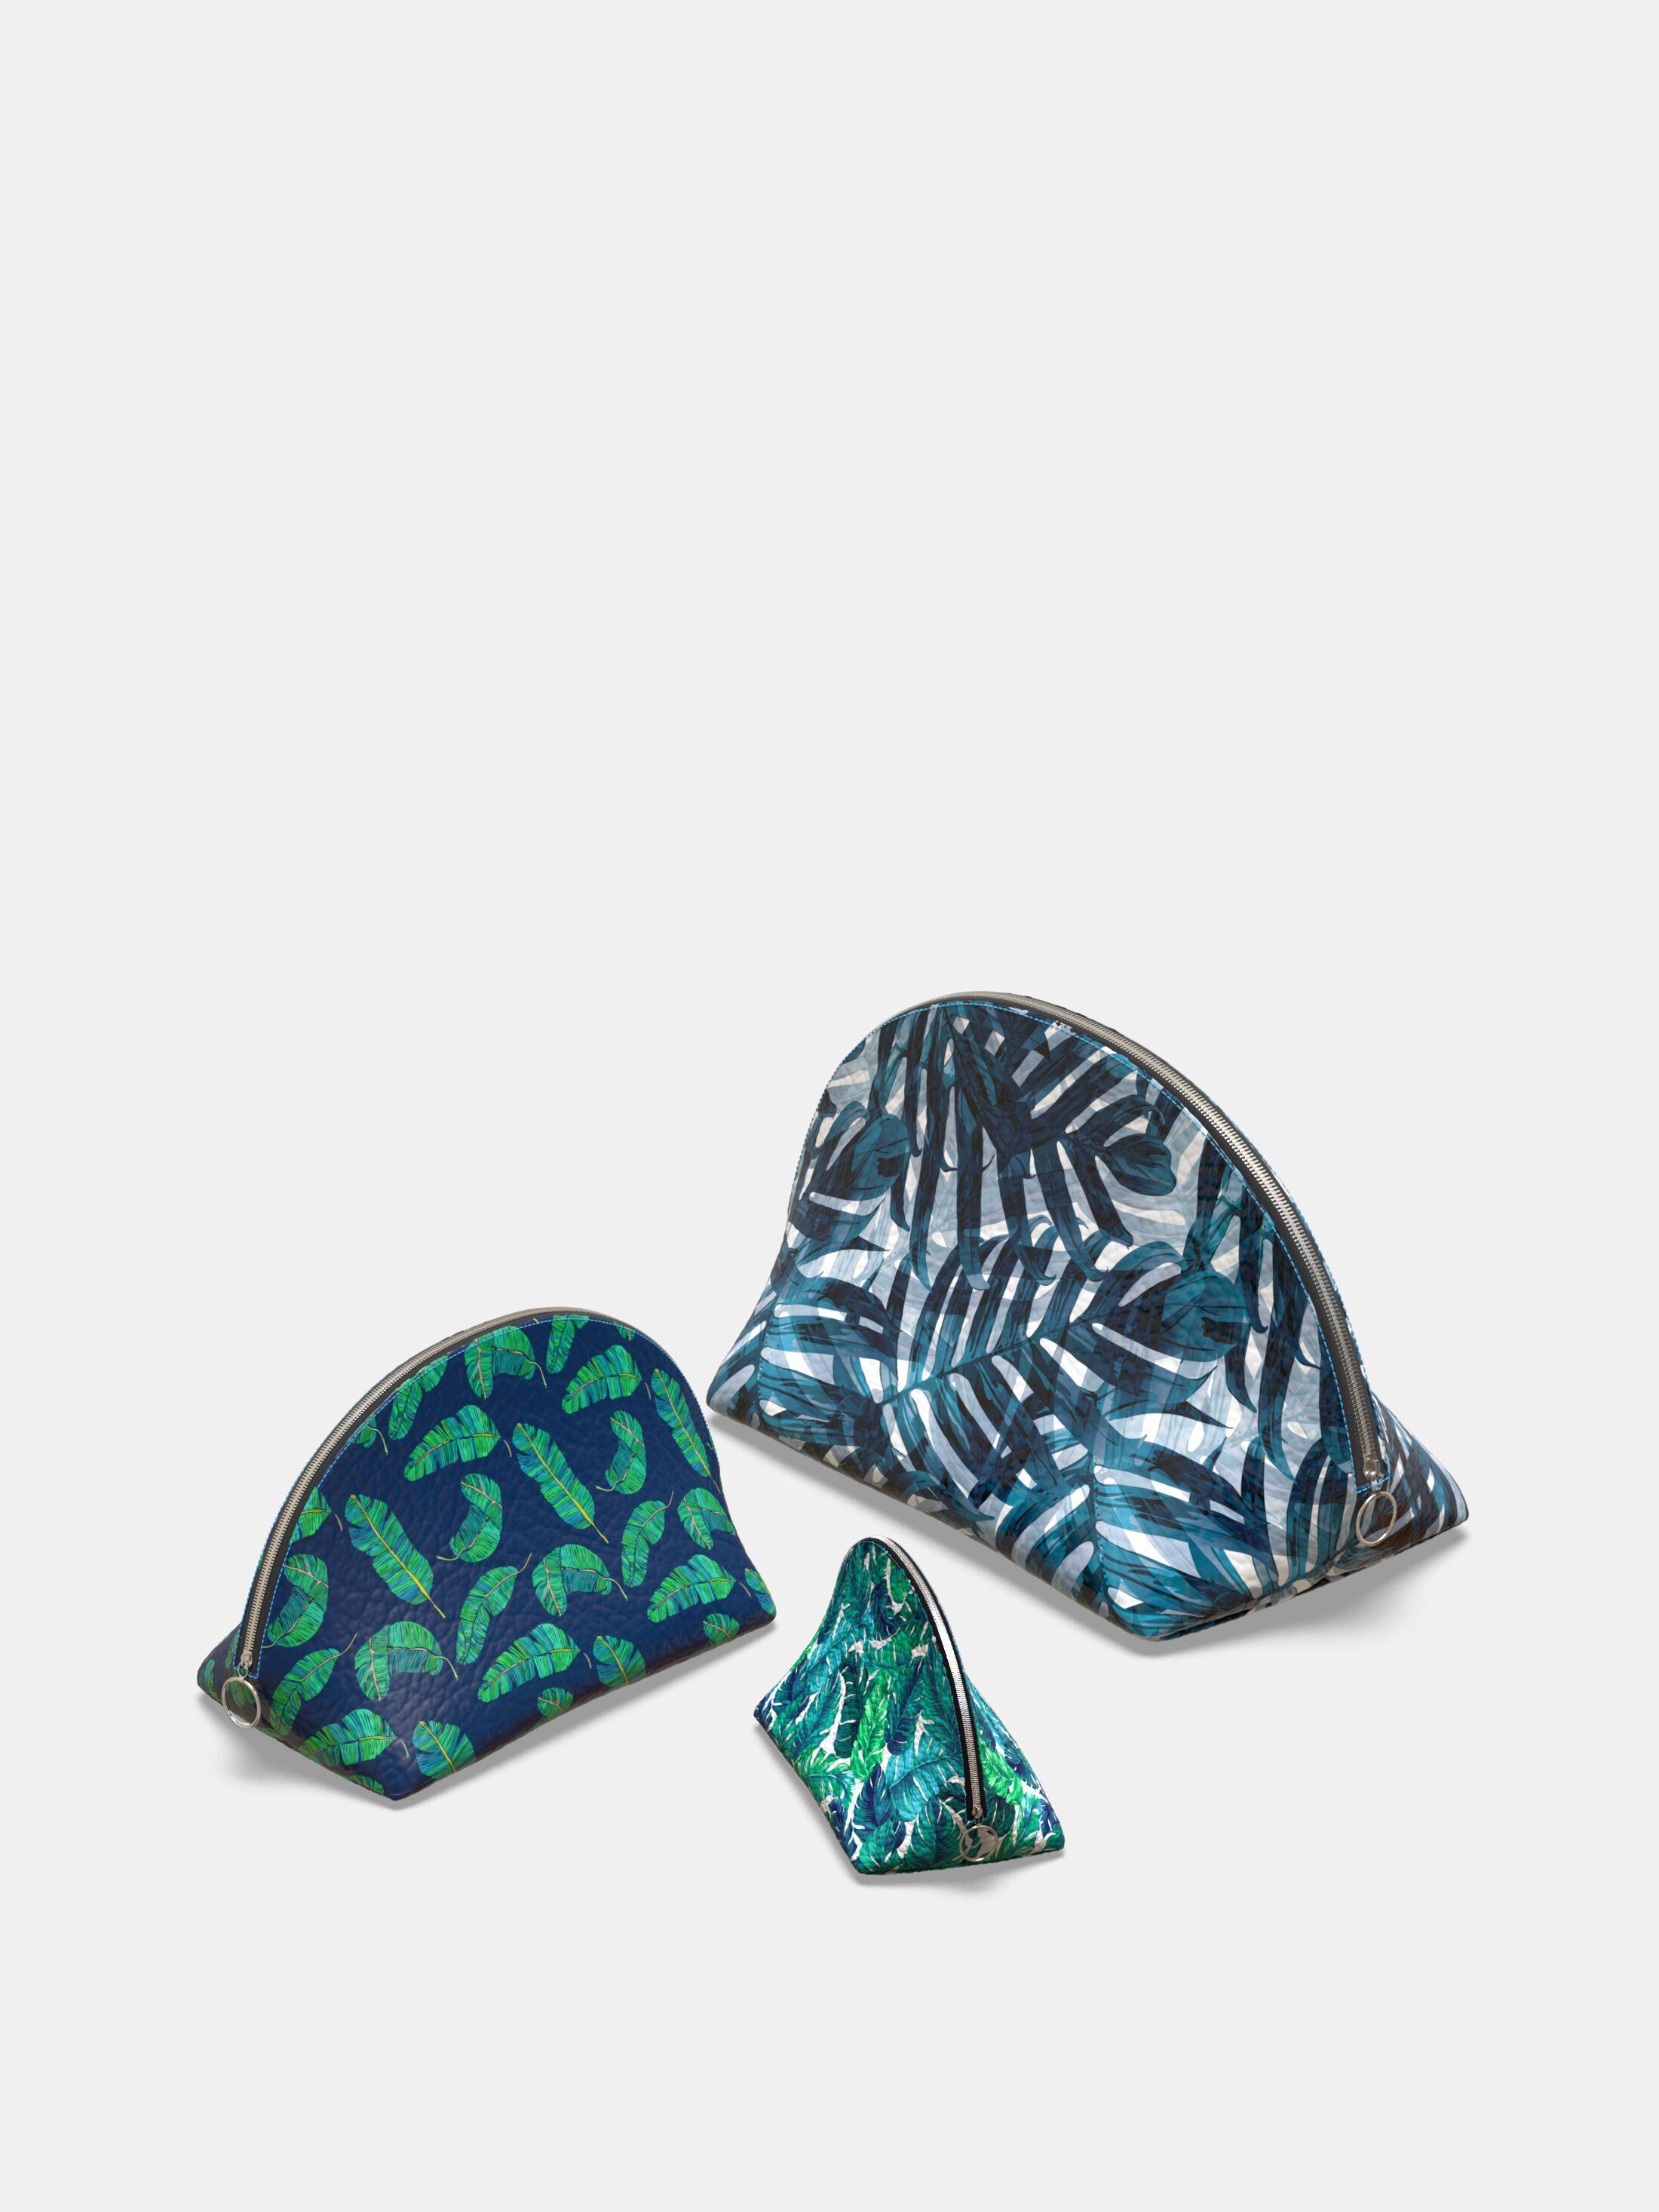 custom leather cosmetic bags